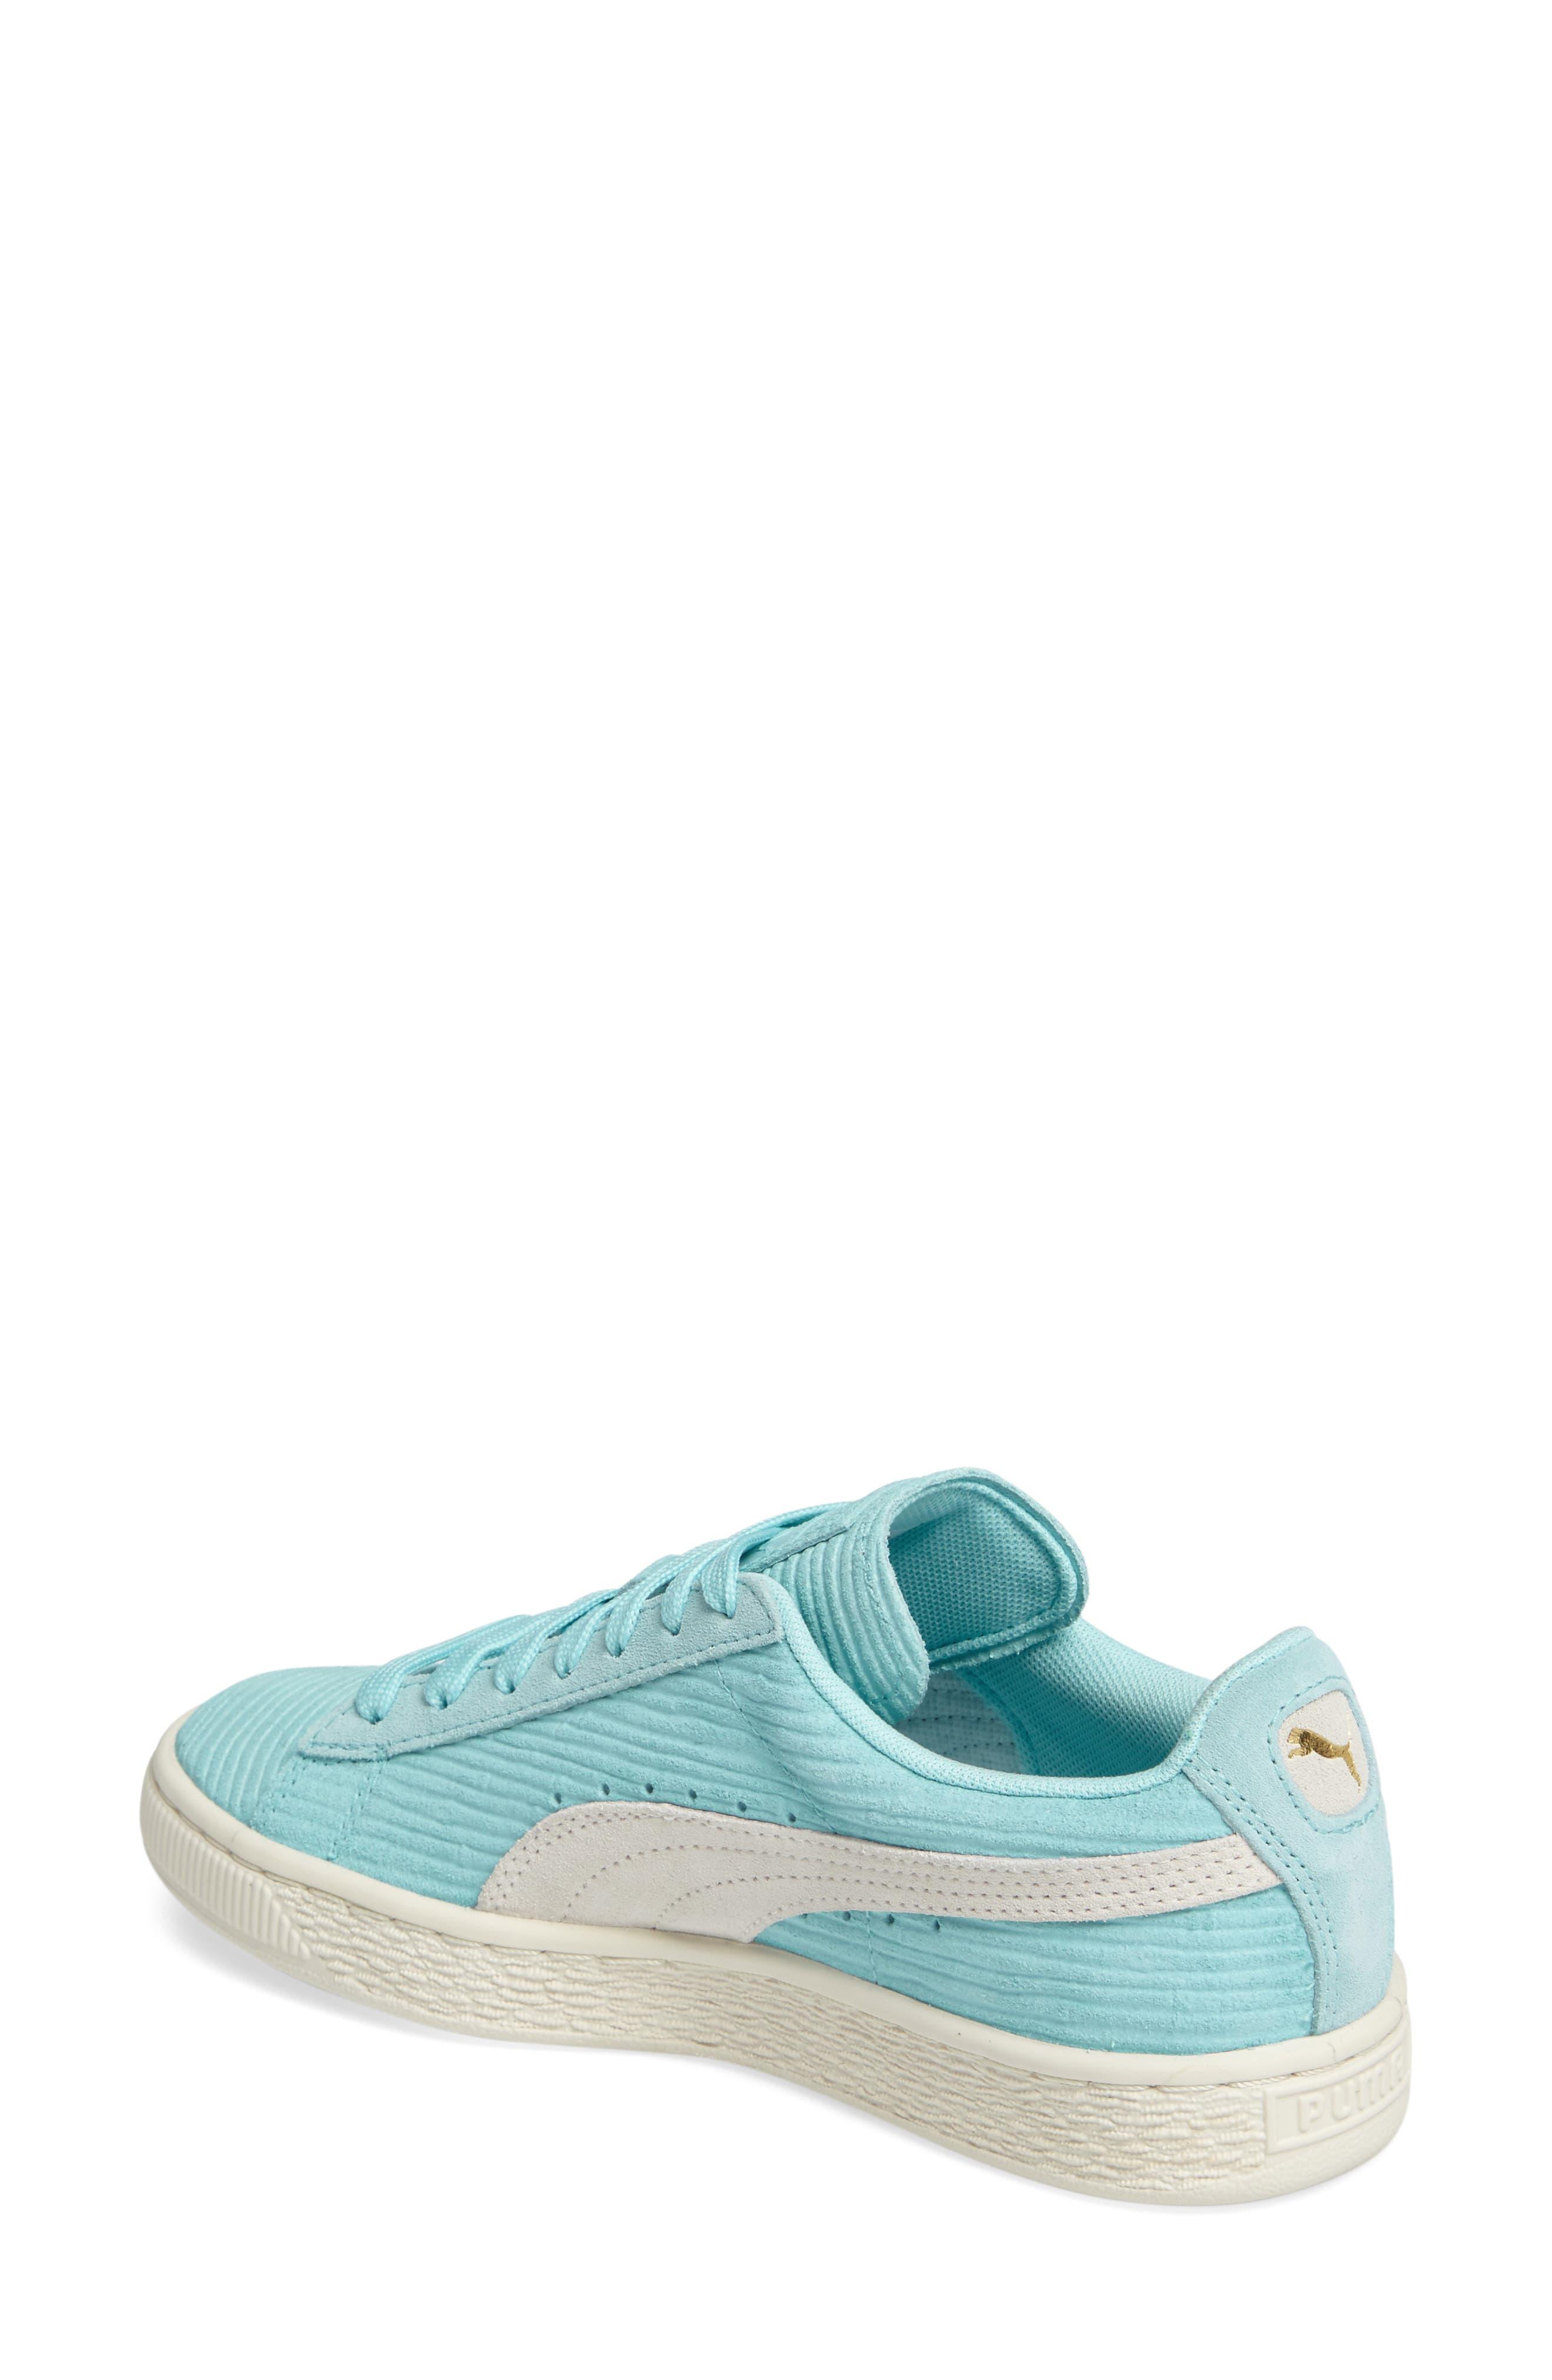 Alternate Image 2  - PUMA Suede Classic Embossed Sneaker (Women)